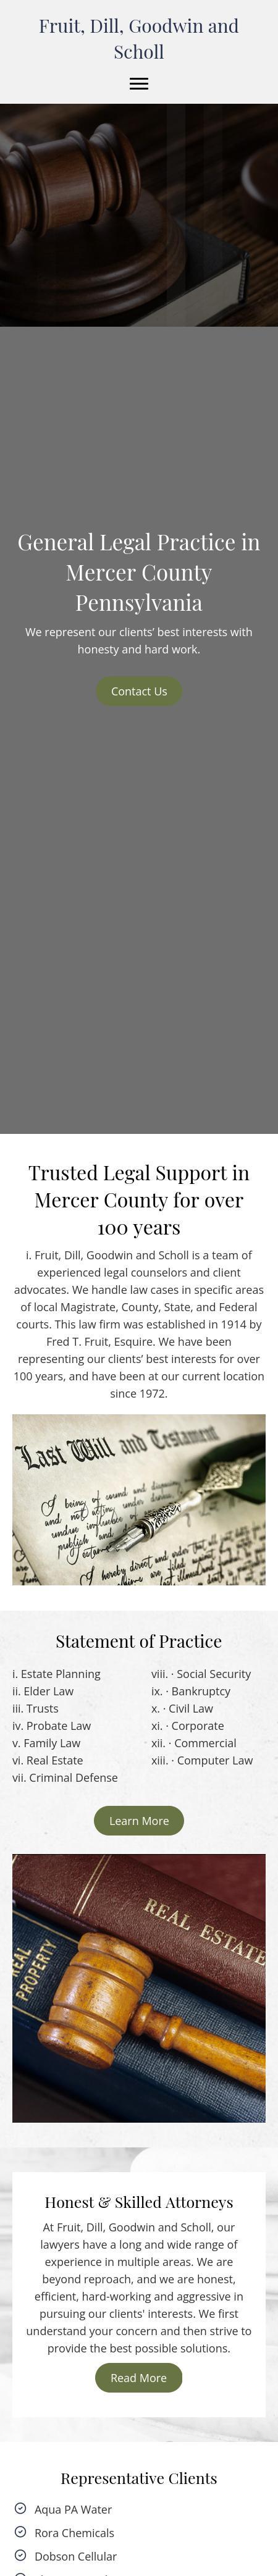 Fruit, Dill, Goodwin & Scholl | Sharon PA Law | LawyerLand